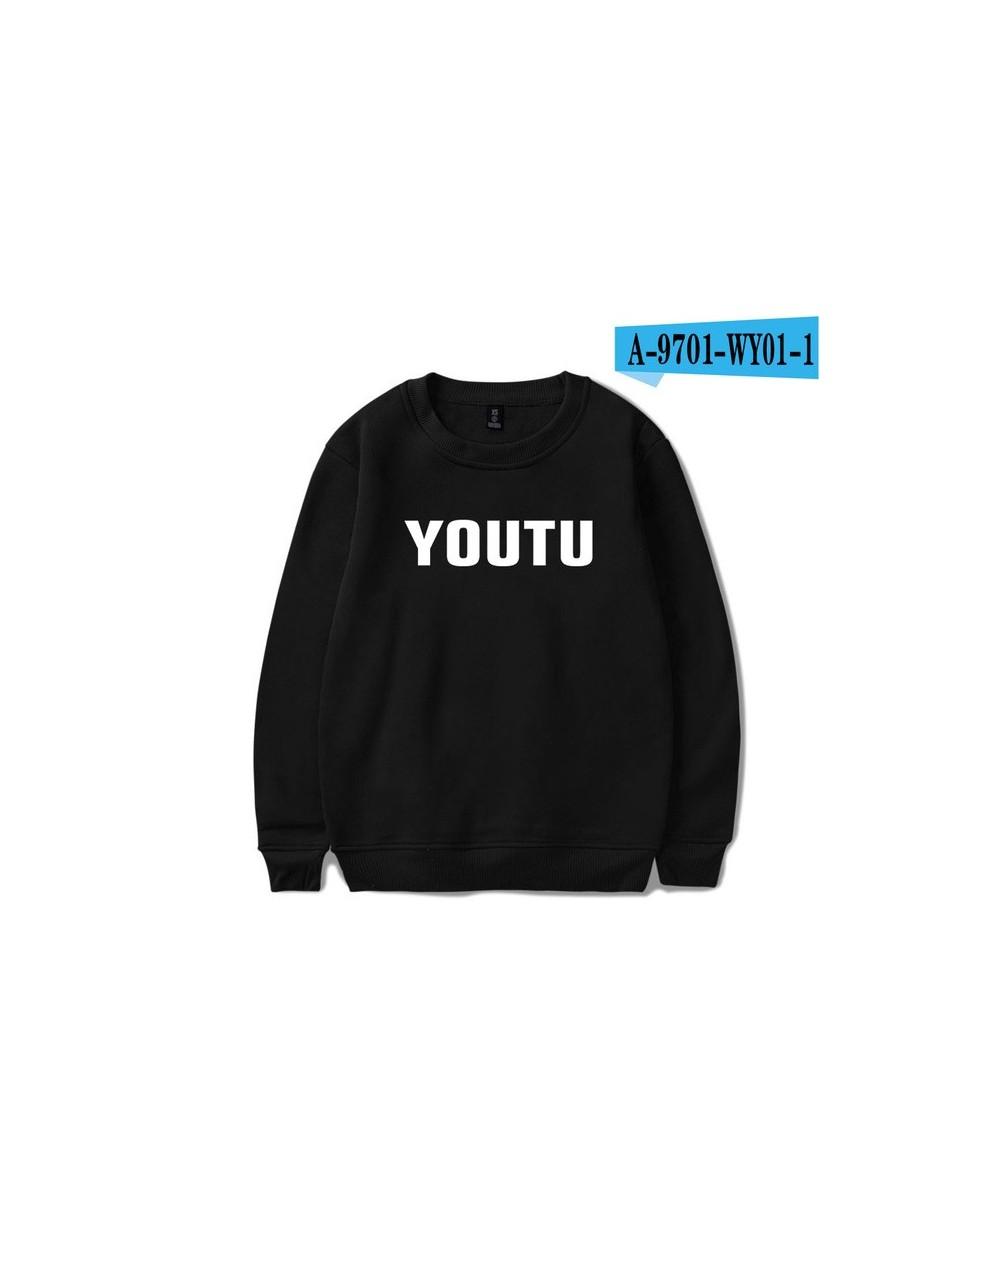 Hip Hop Women And Men Clothes 2018 Capless Hoodies Sweatshirts Harajuku Shawn Mendes Tops Kawaii Harajuku PlusSize - Black -...